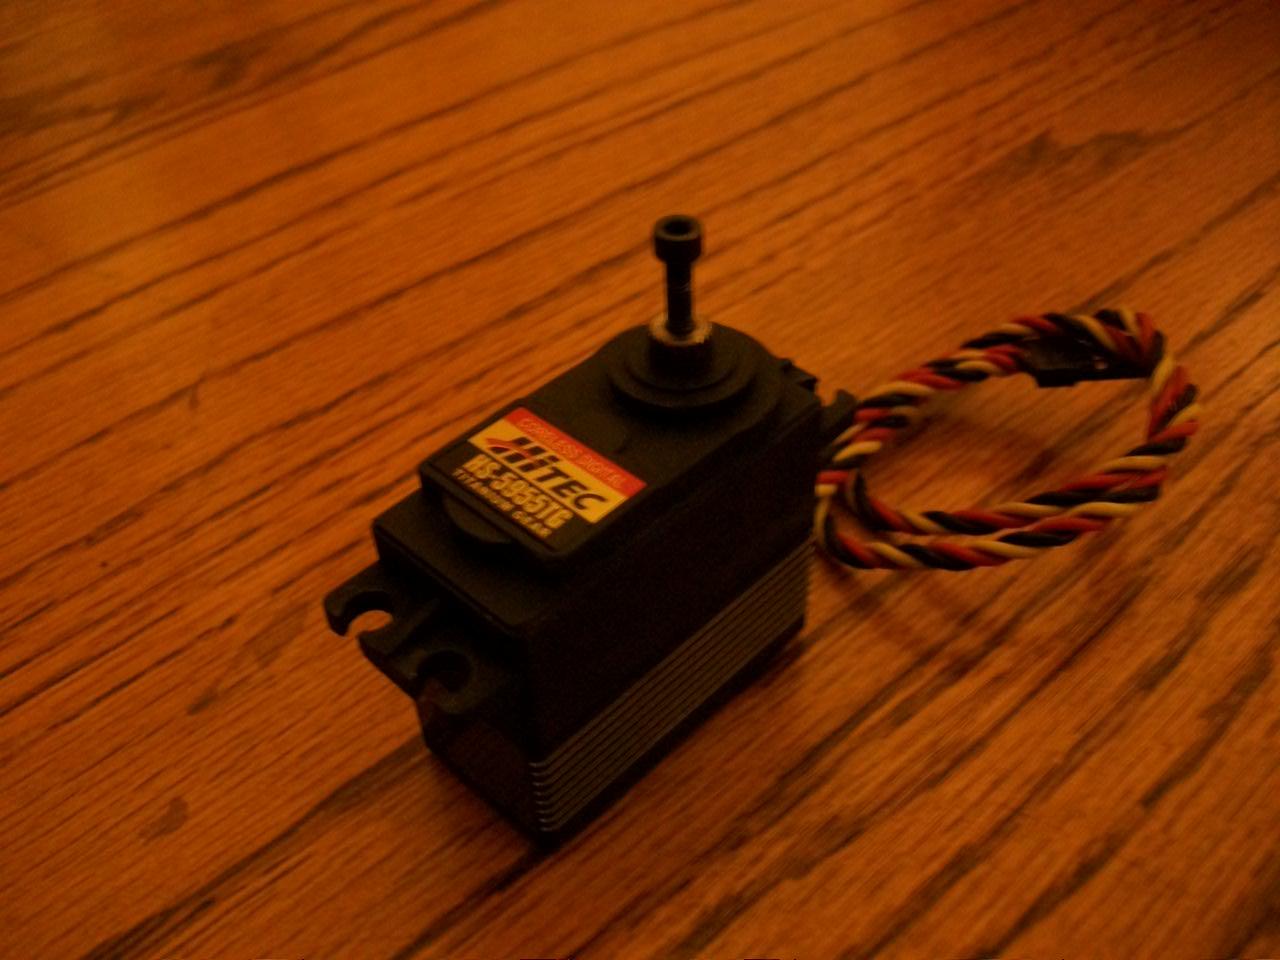 hitec servo wiring diagram e bike controller hs 5995tg futaba s9351 r c